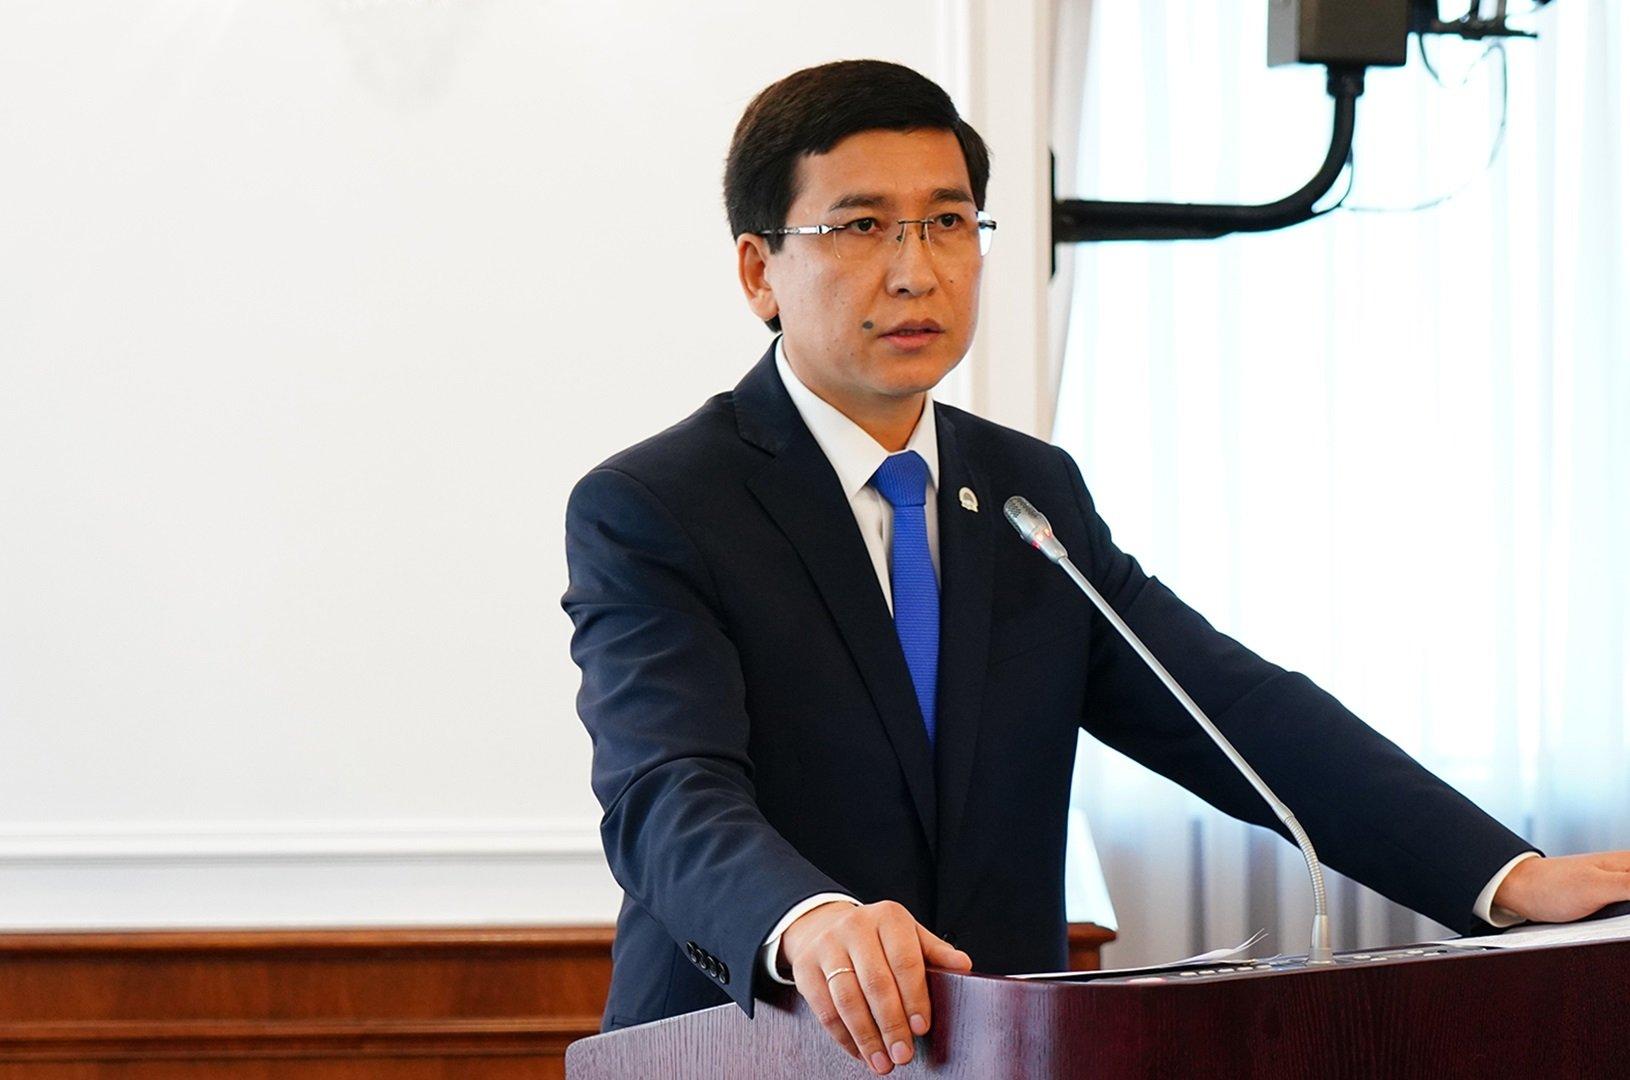 Министр образования Казахстана Аймагамбетов объявил дату окончания учебного года